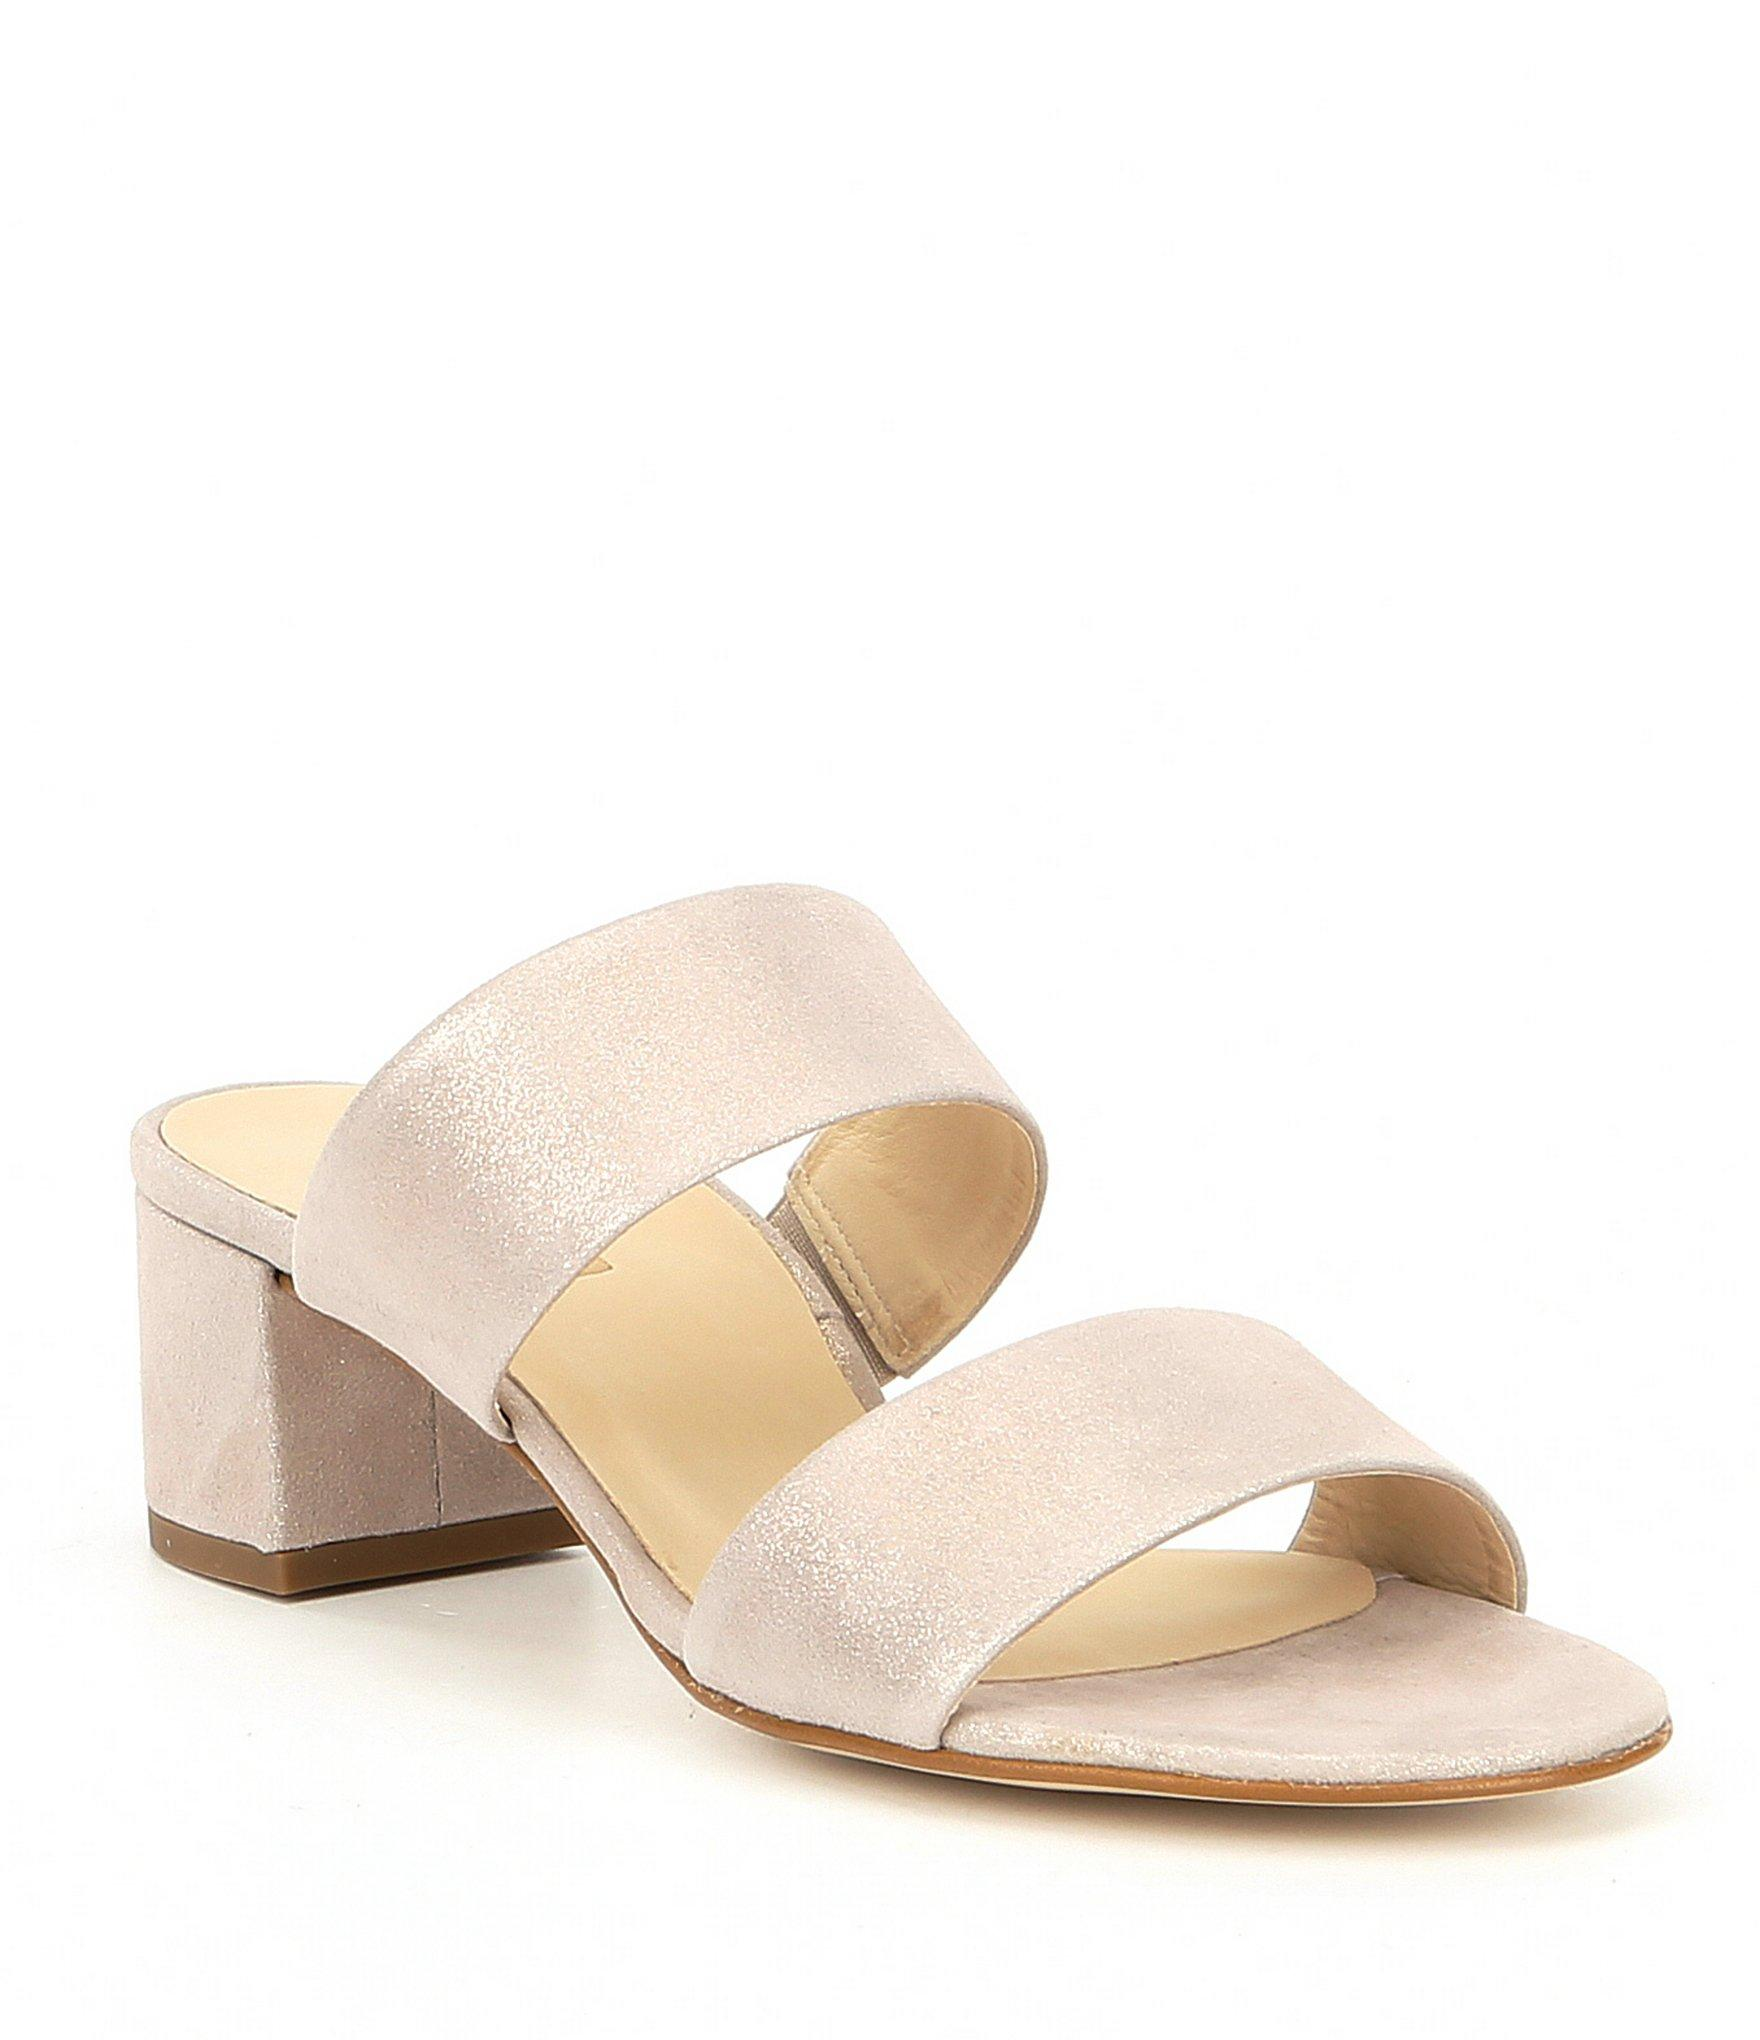 bd35db4c7fb Lyst - Paul Green Meg Suede Block Heel Sandals in Blue - Save 4%